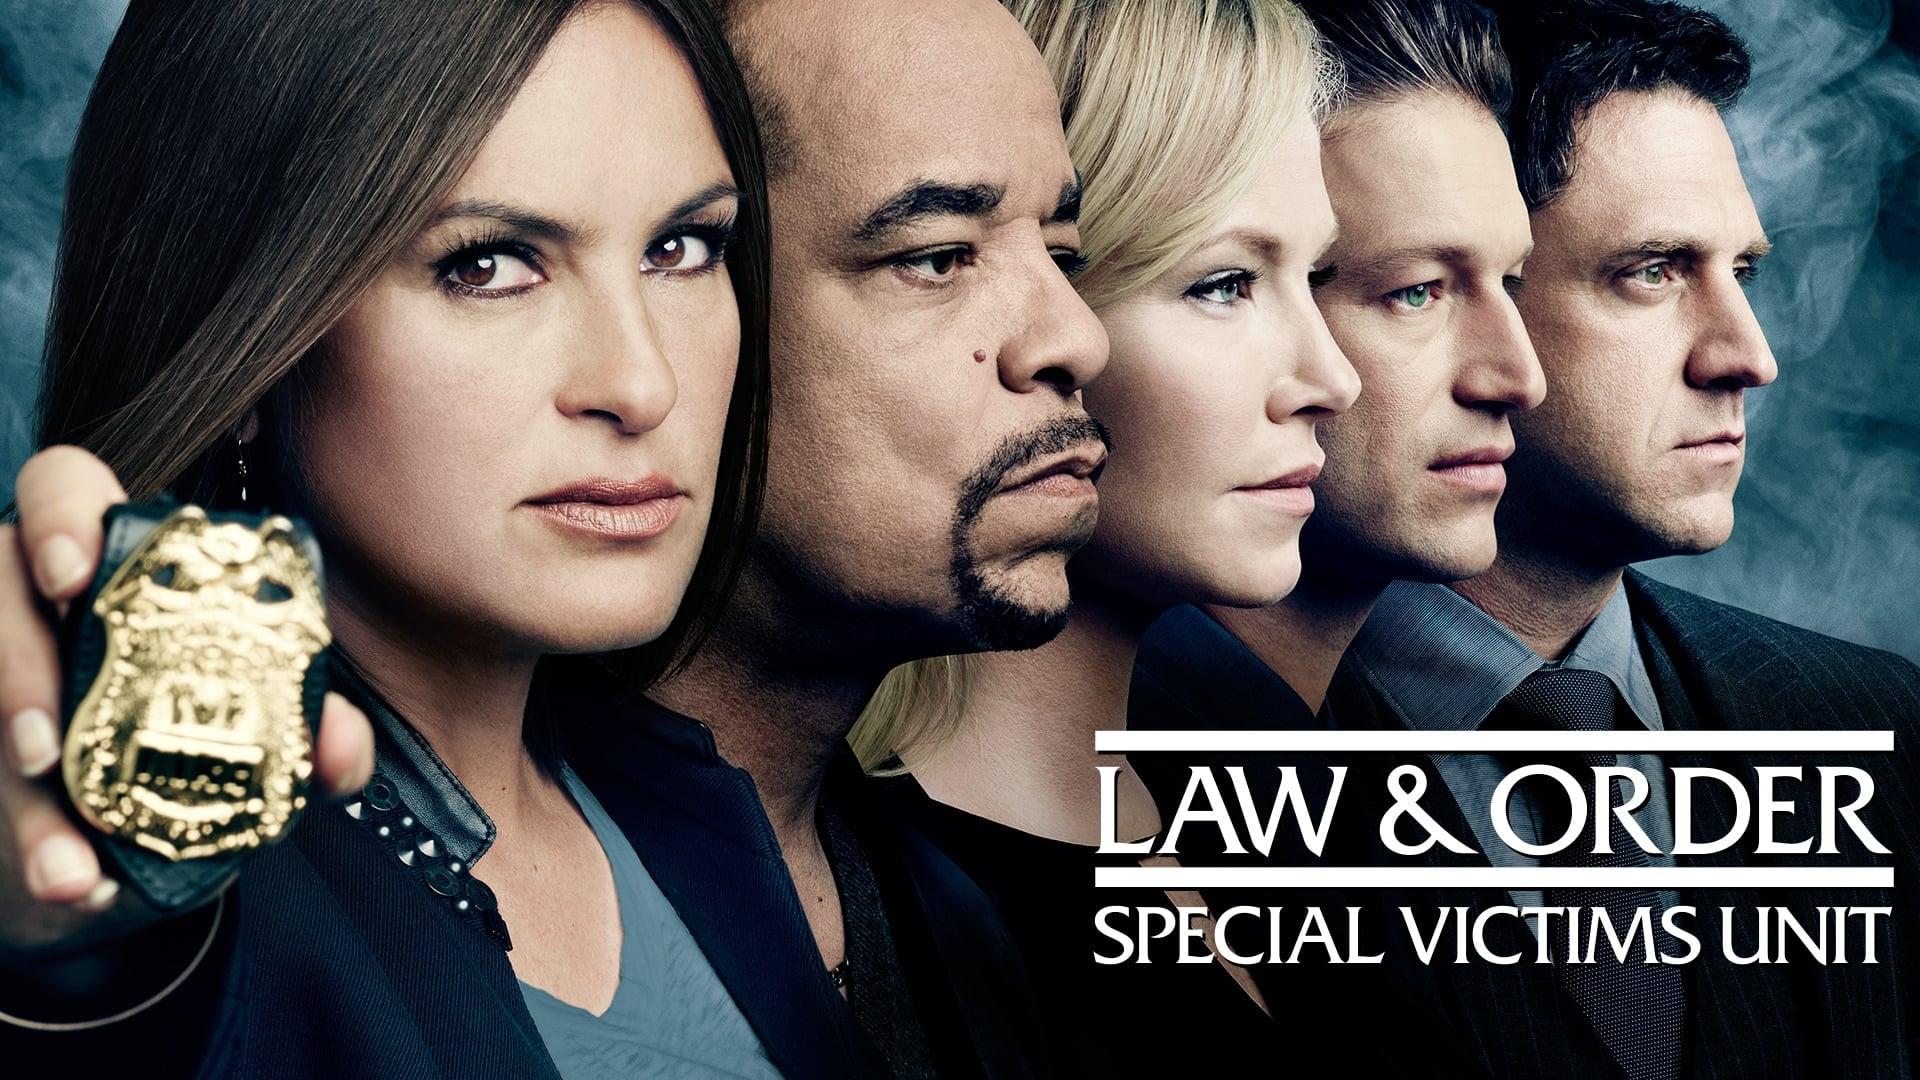 Law & Order: Special Victims Unit - Season 9